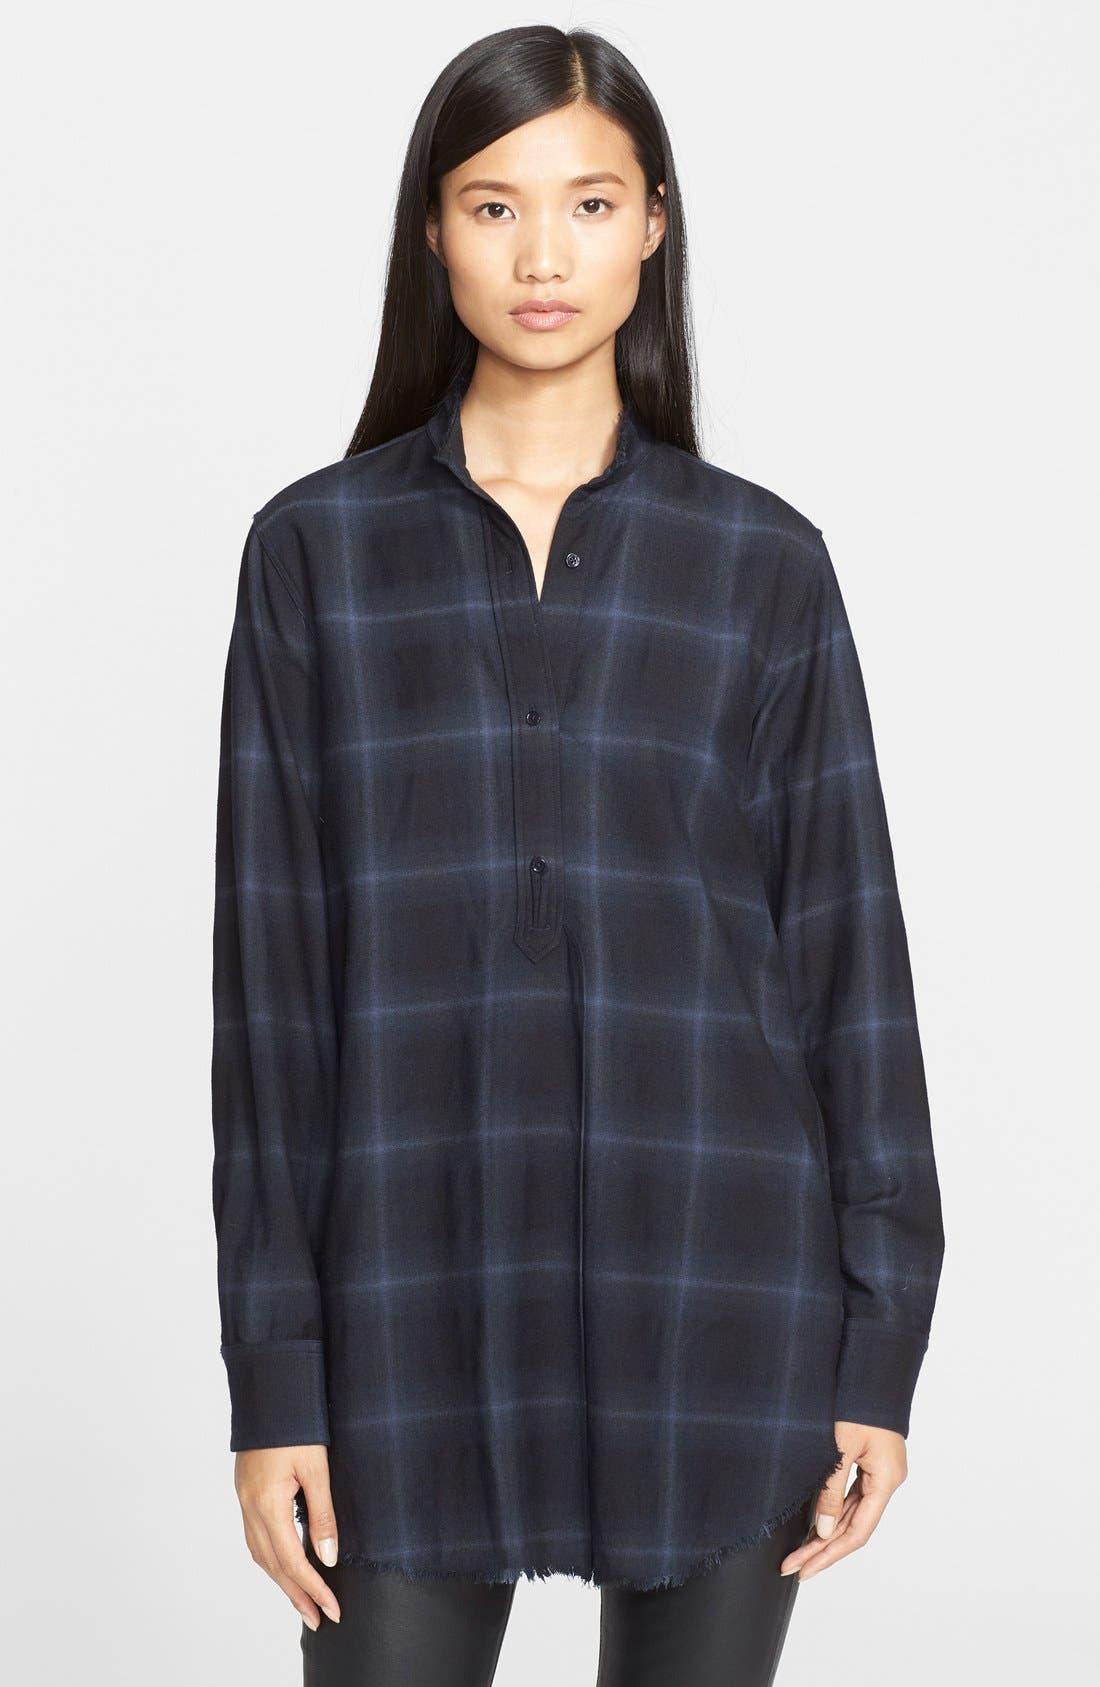 Alternate Image 1 Selected - Helmut Lang Plaid Wool & Cashmere Flannel Shirt